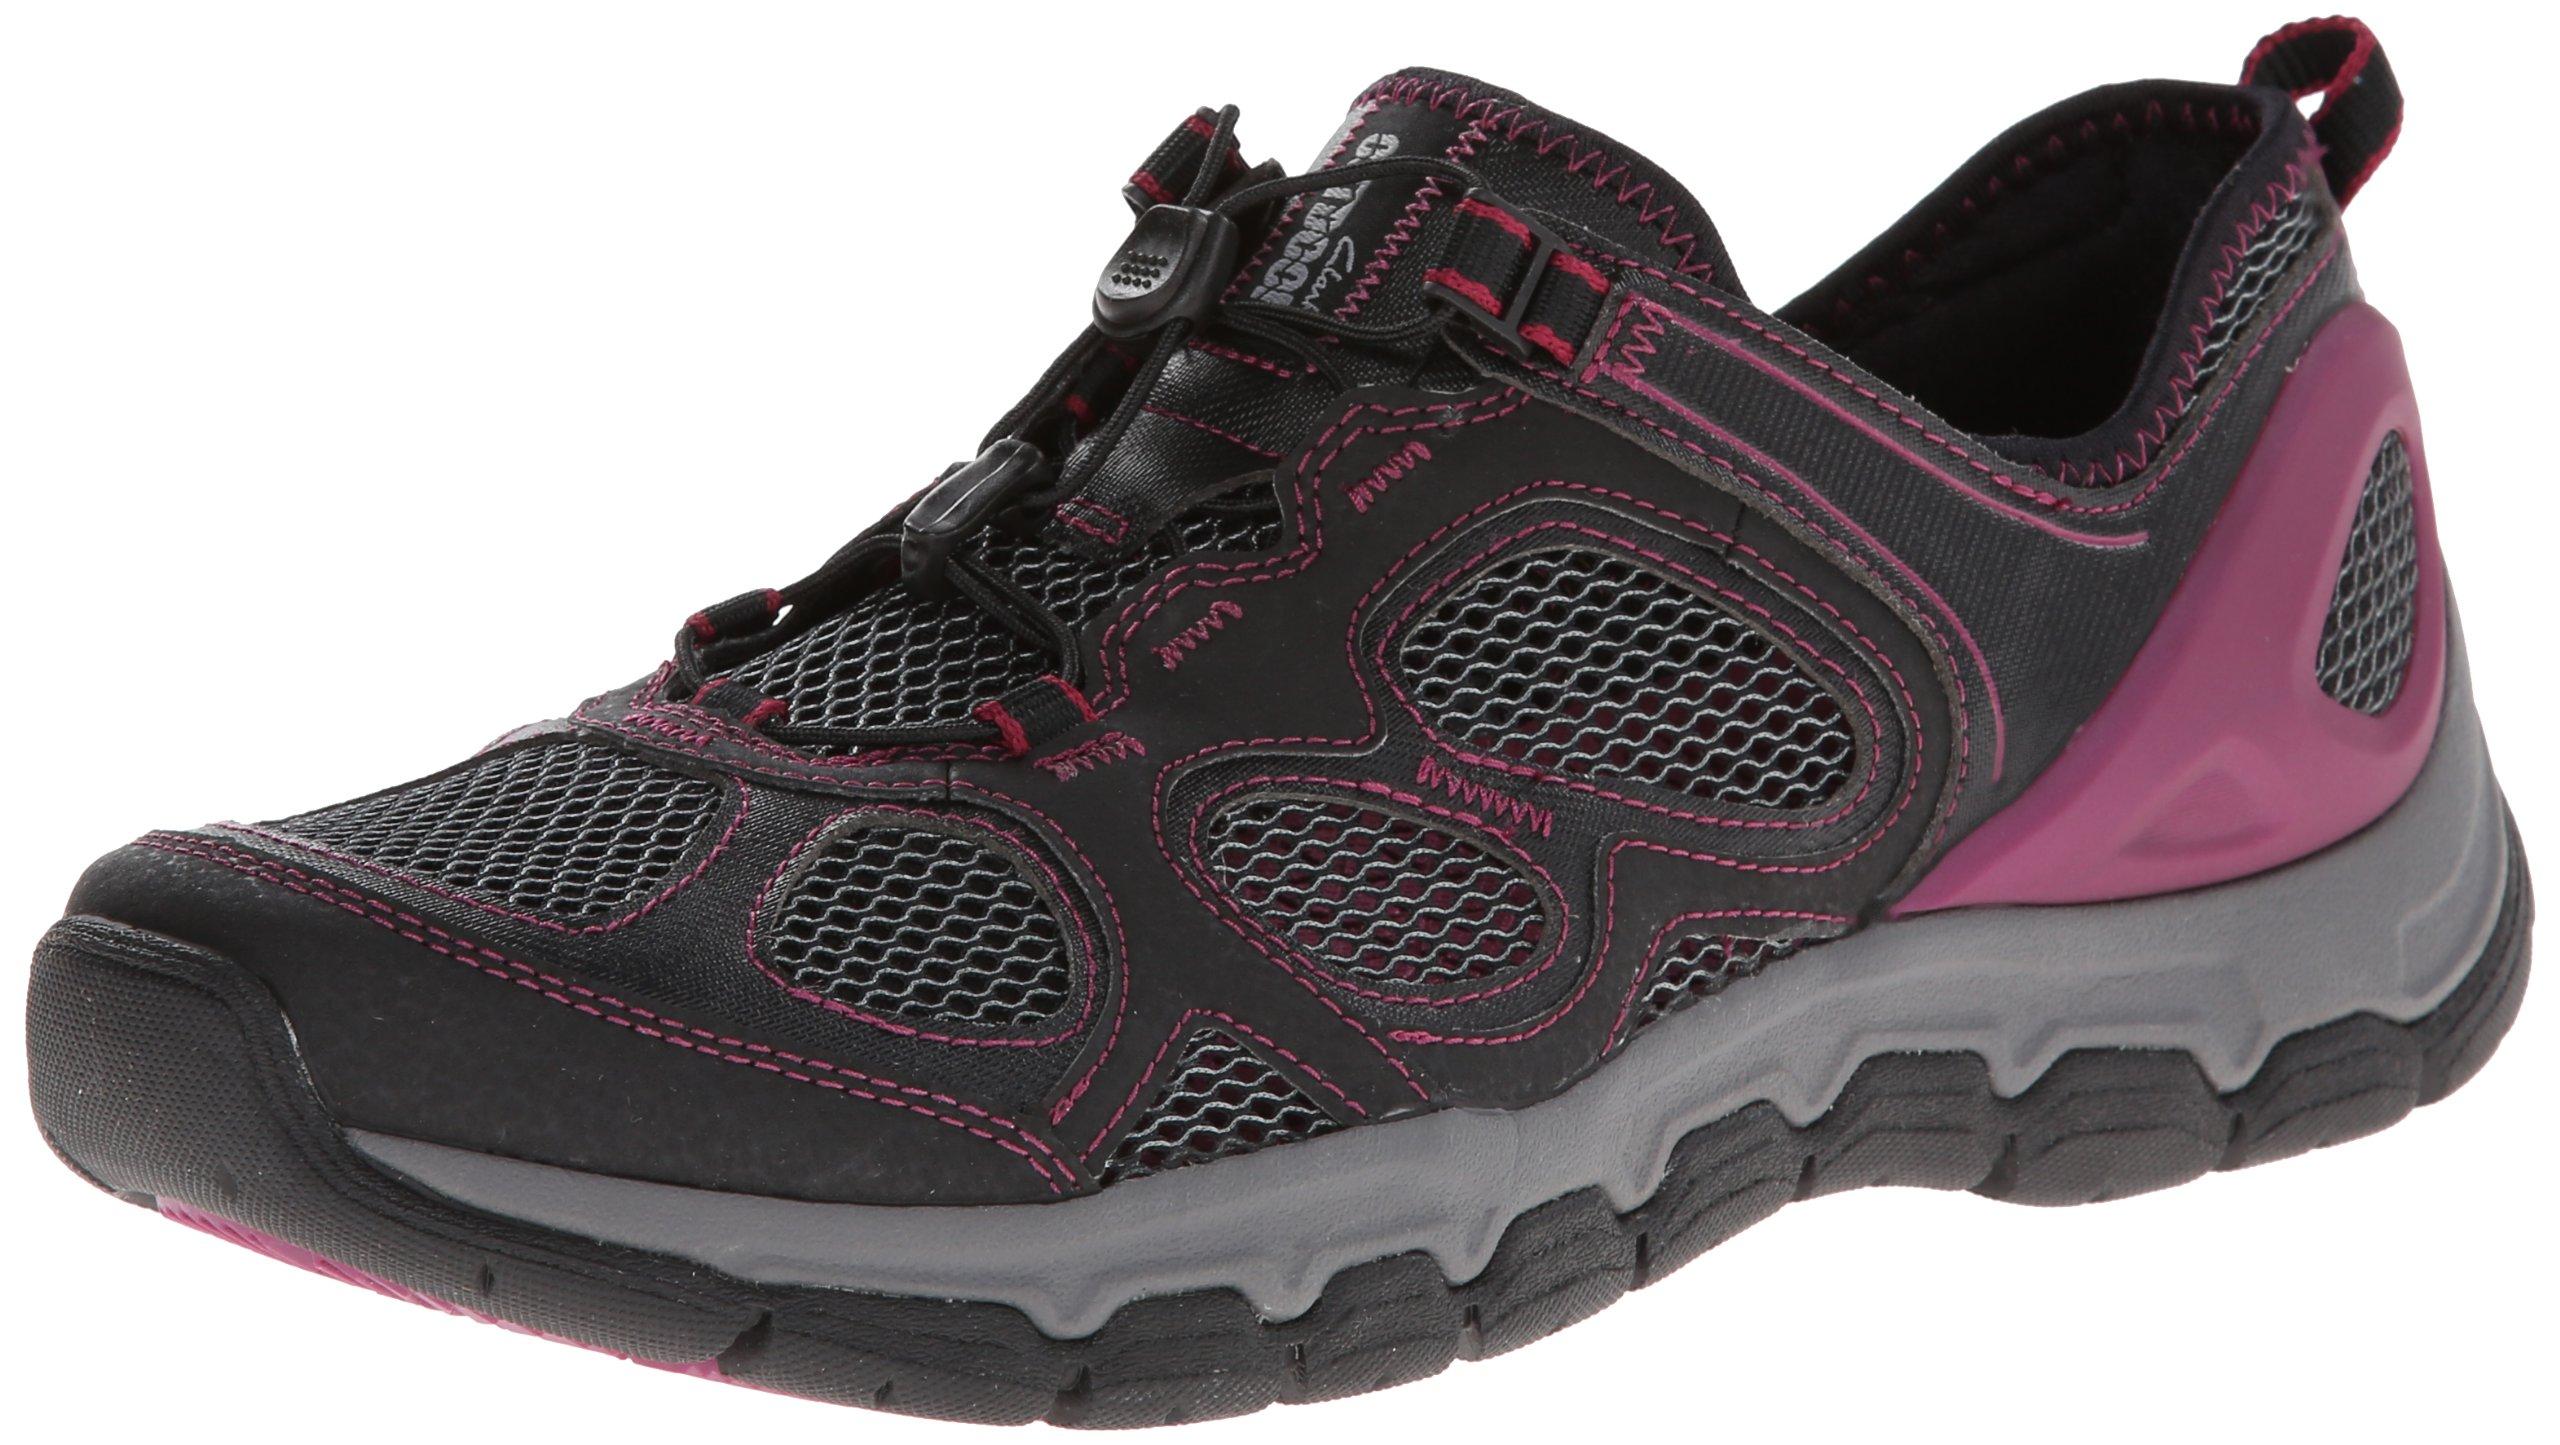 Clarks Women's Inframe Ease Water Shoe,Black,8 M US